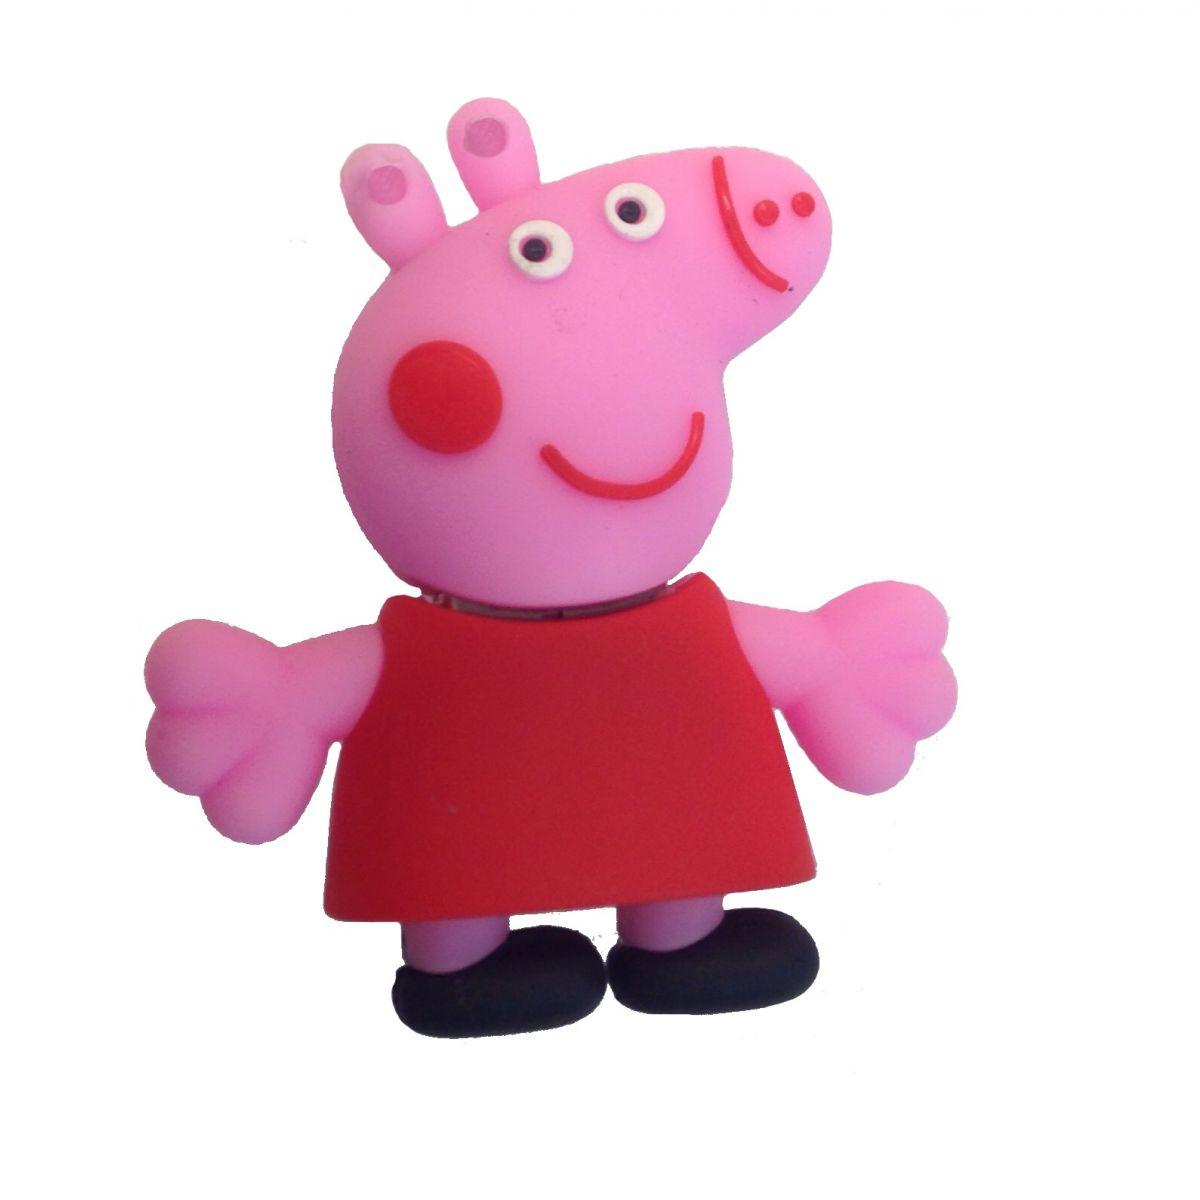 PenDrive Desenho Animado Peppa Pig USB 2.0 8GB